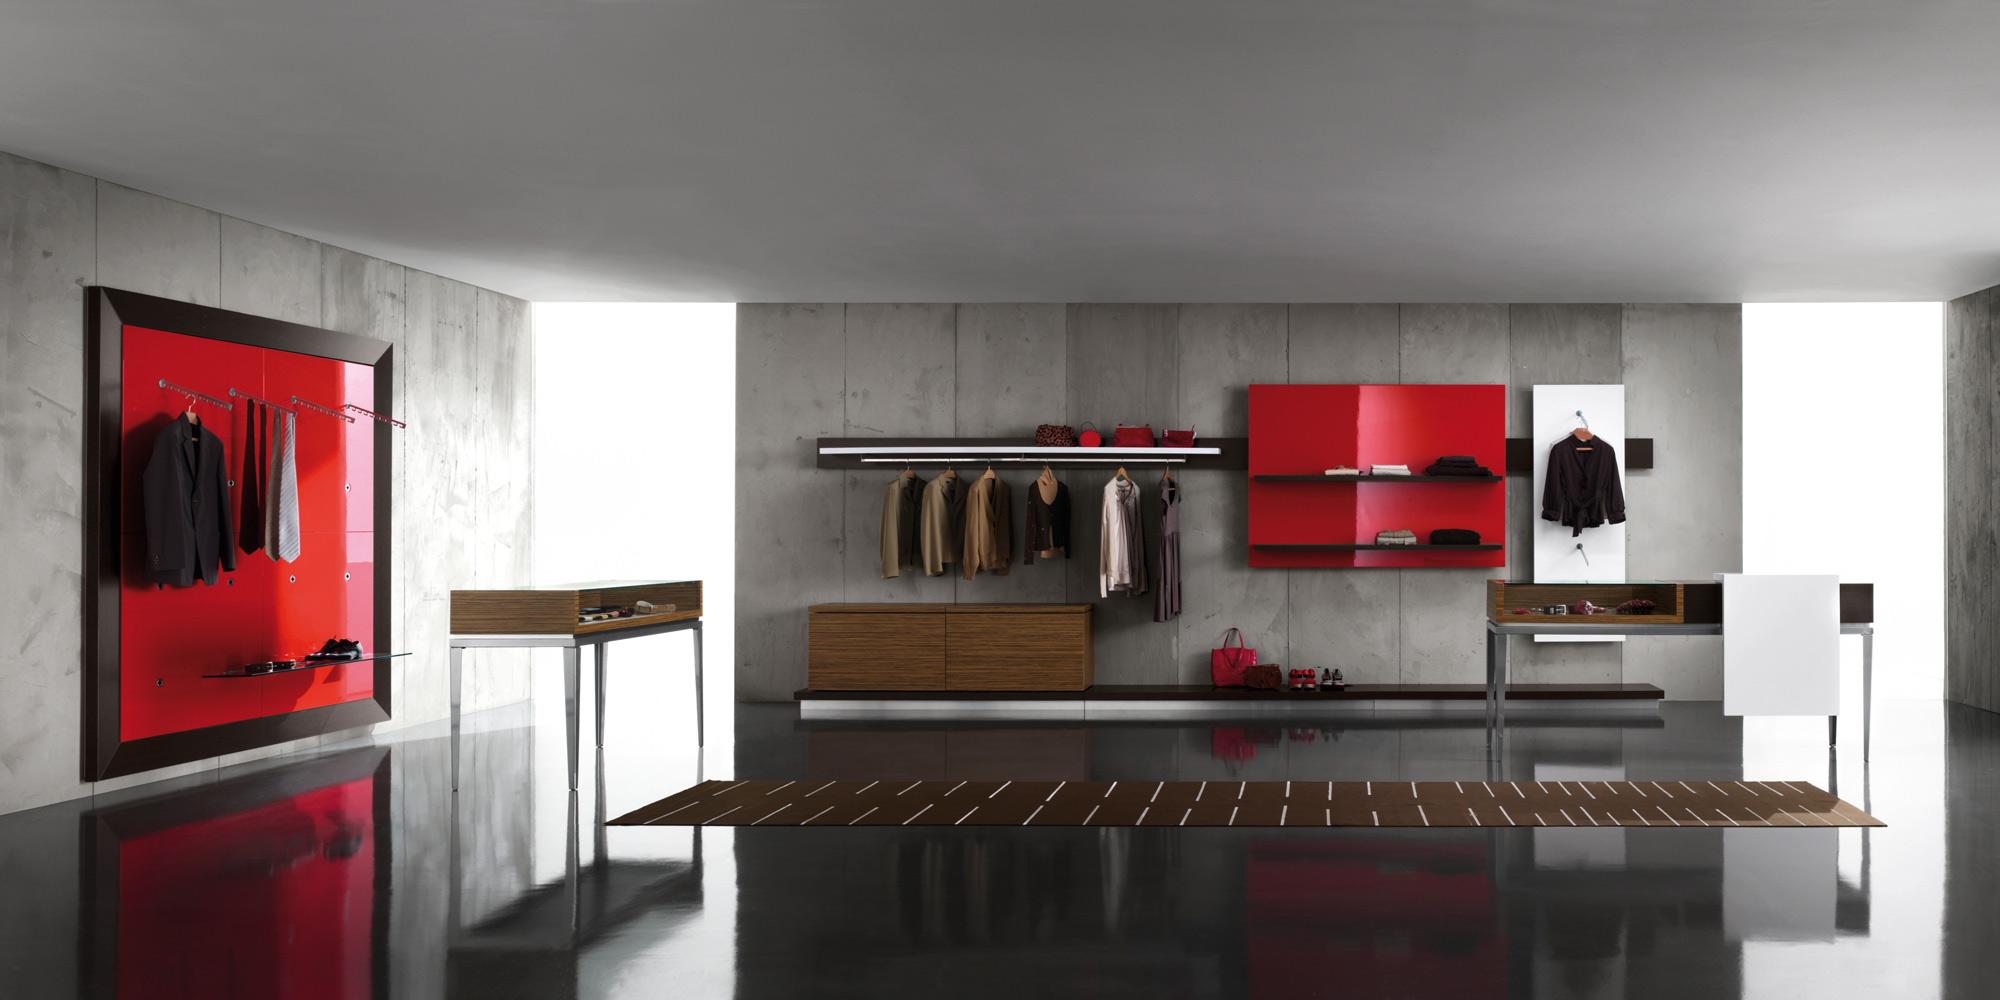 Arredamento per negozi di abbigliamento toscana belardi for Shopping online arredamento